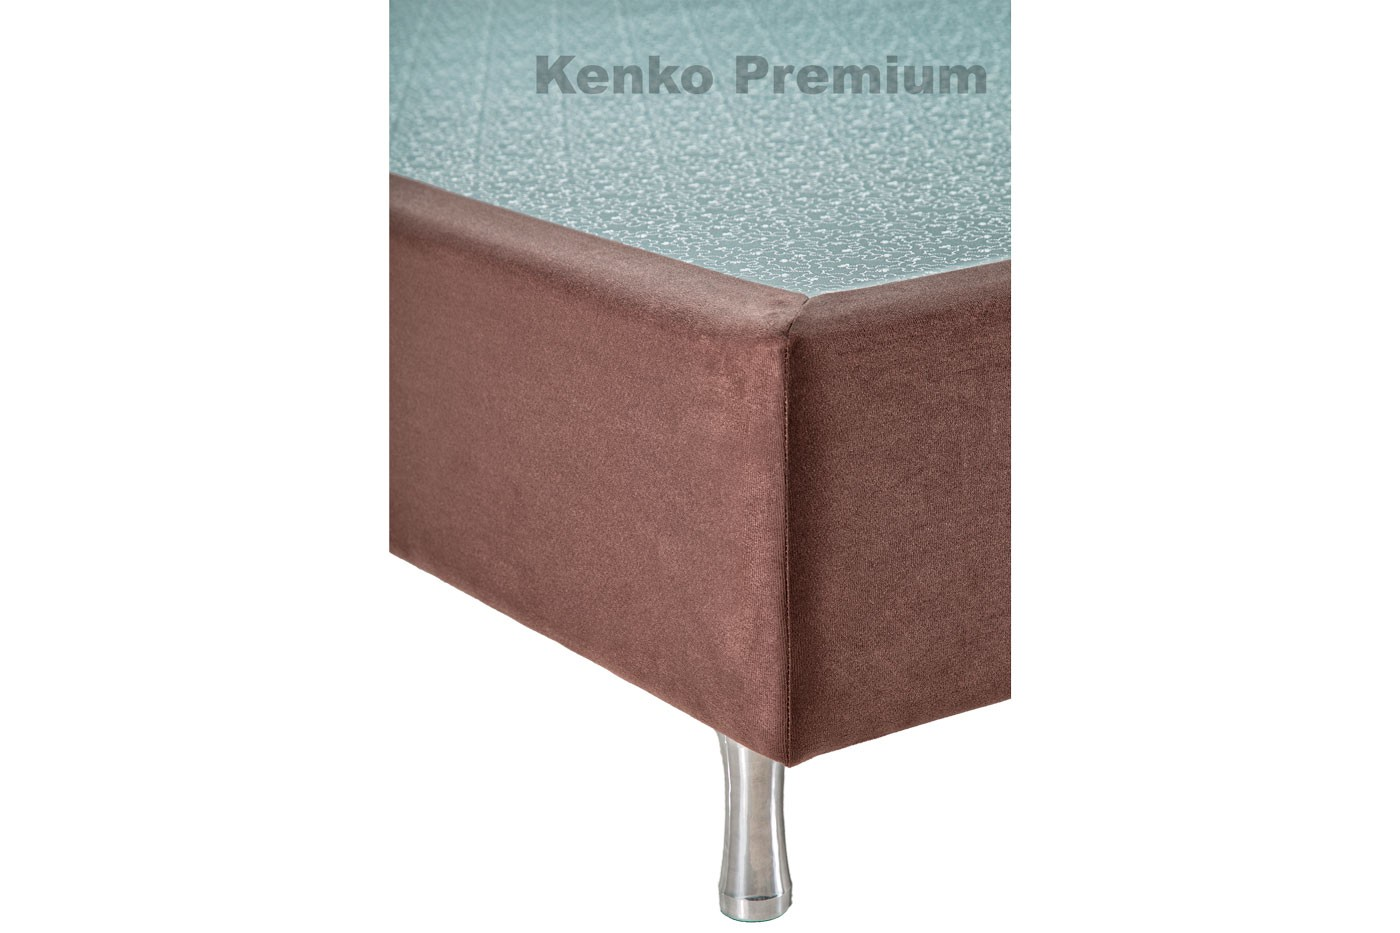 Box Base Para Colchão Casal Suede 1,38x1,88 Kenko Premium   - Kenko Premium Colchões